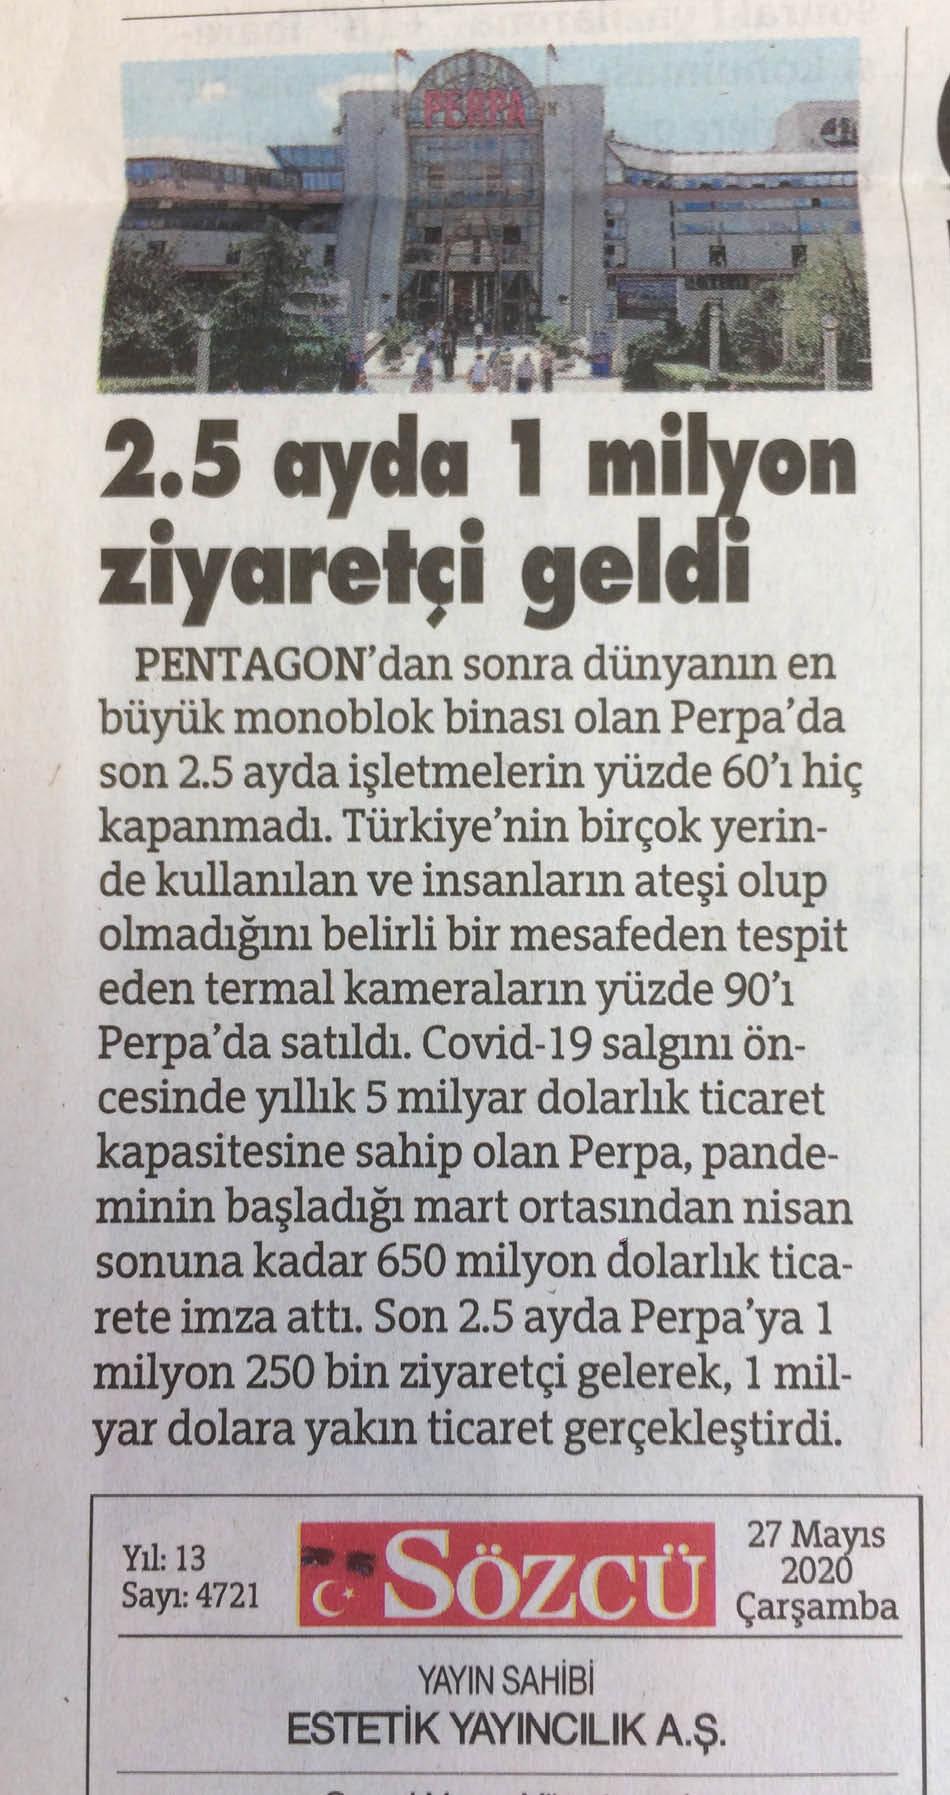 Sözcü Gazetesi Perpa